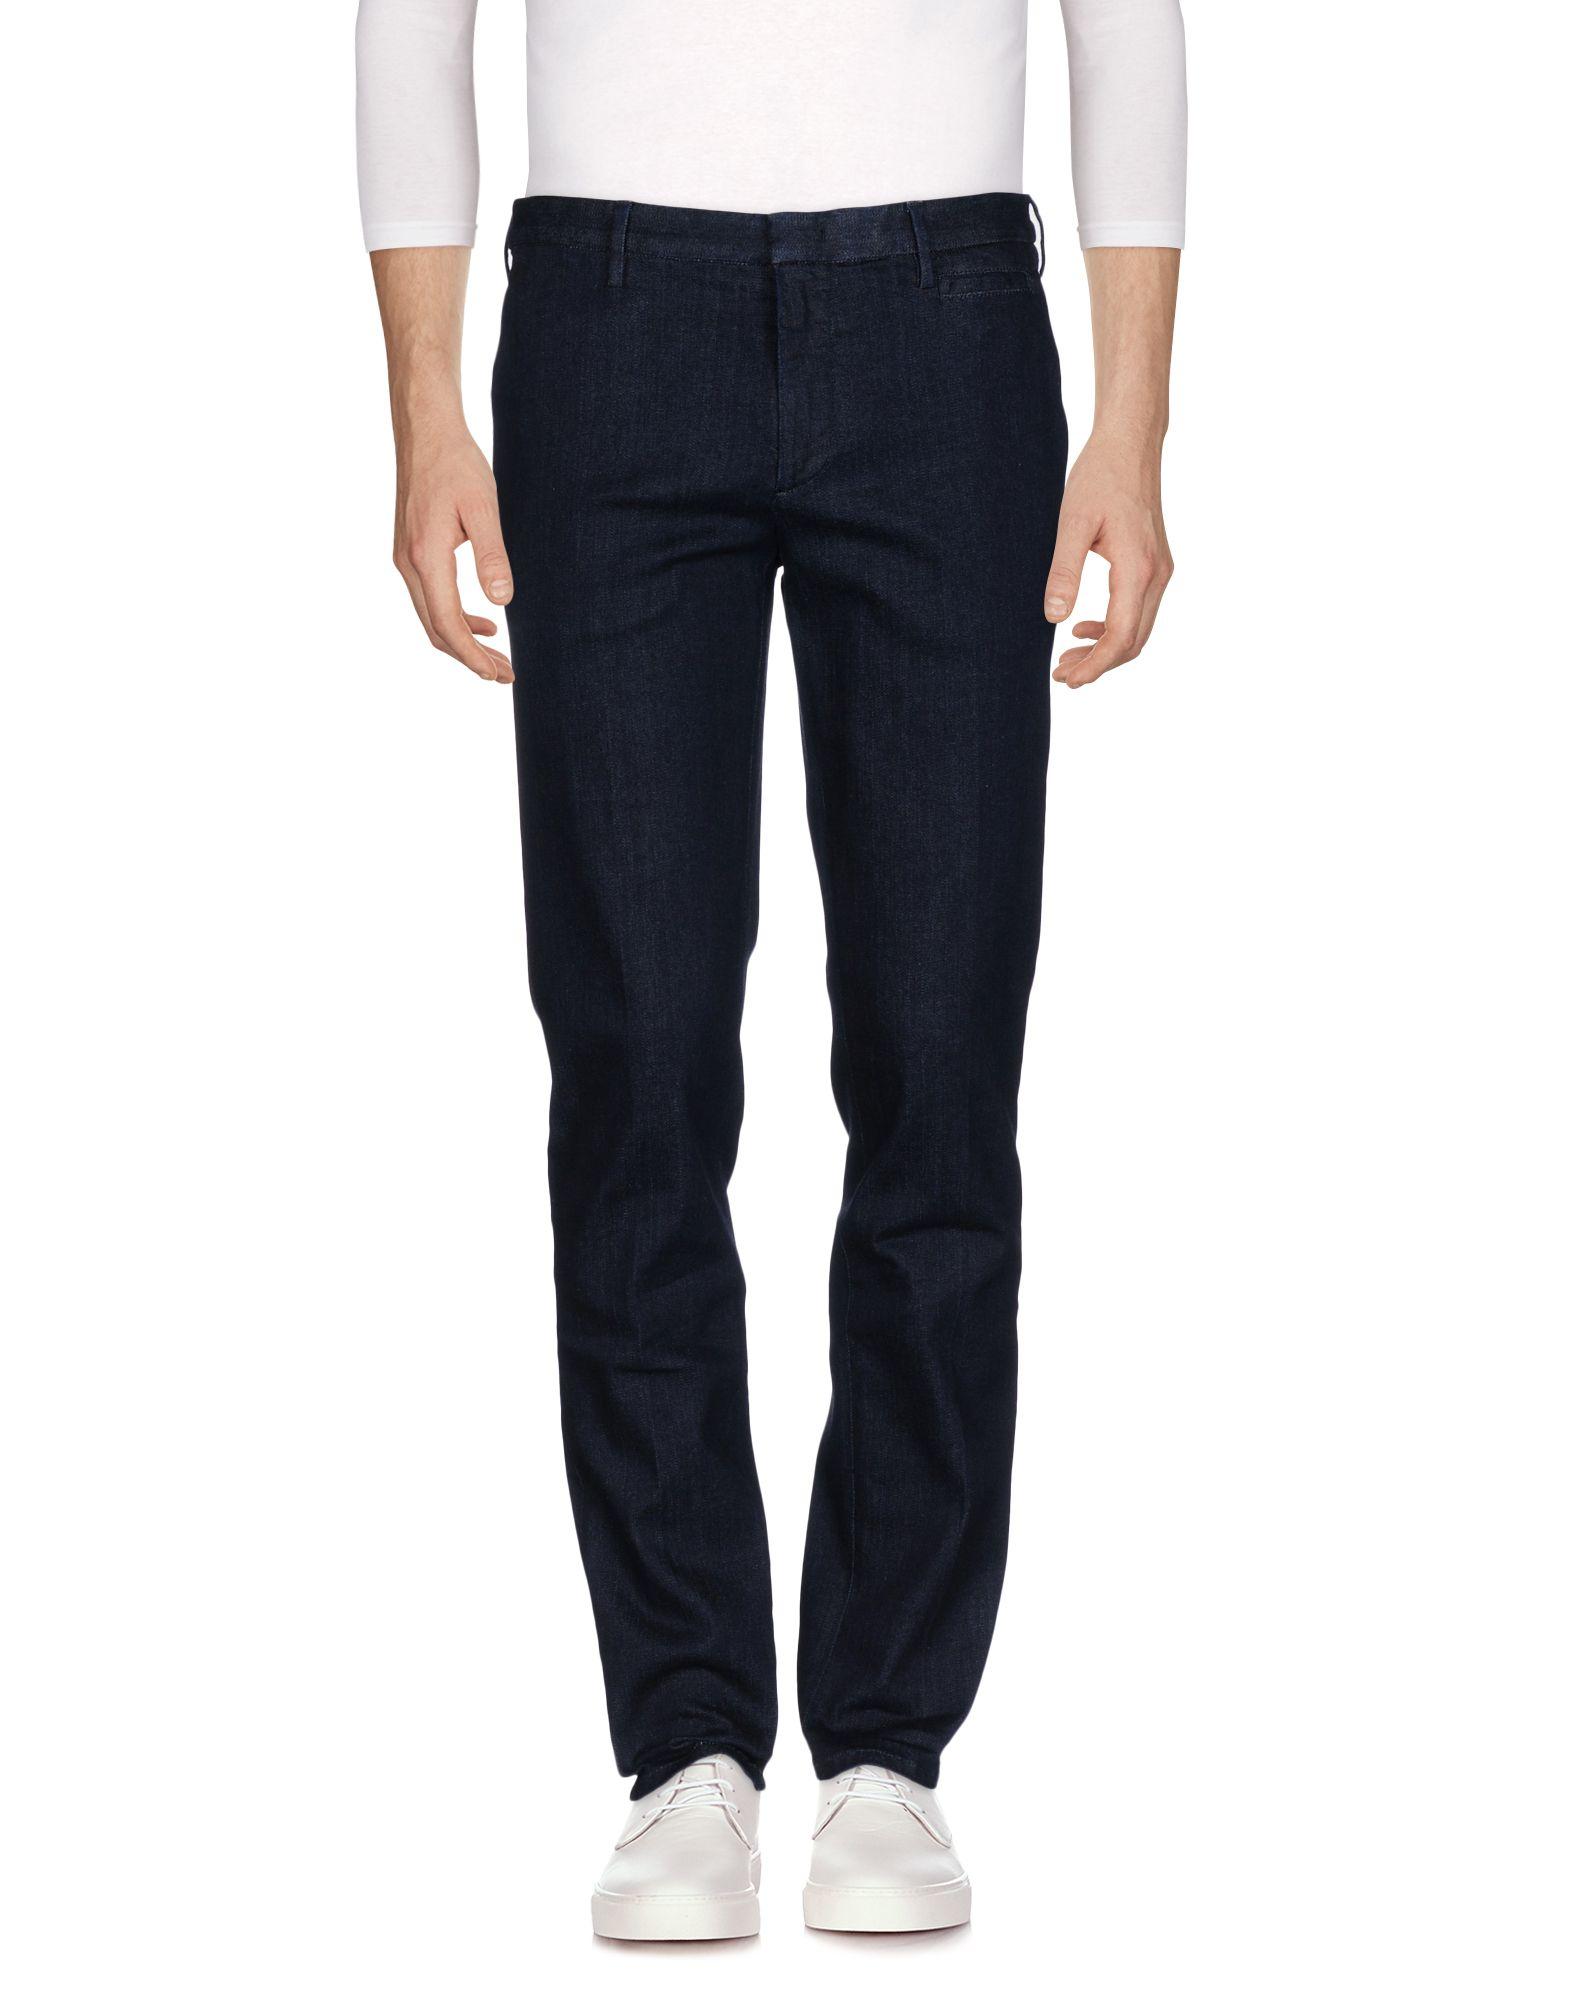 Pantaloni Jeans Prada Donna - Acquista online su